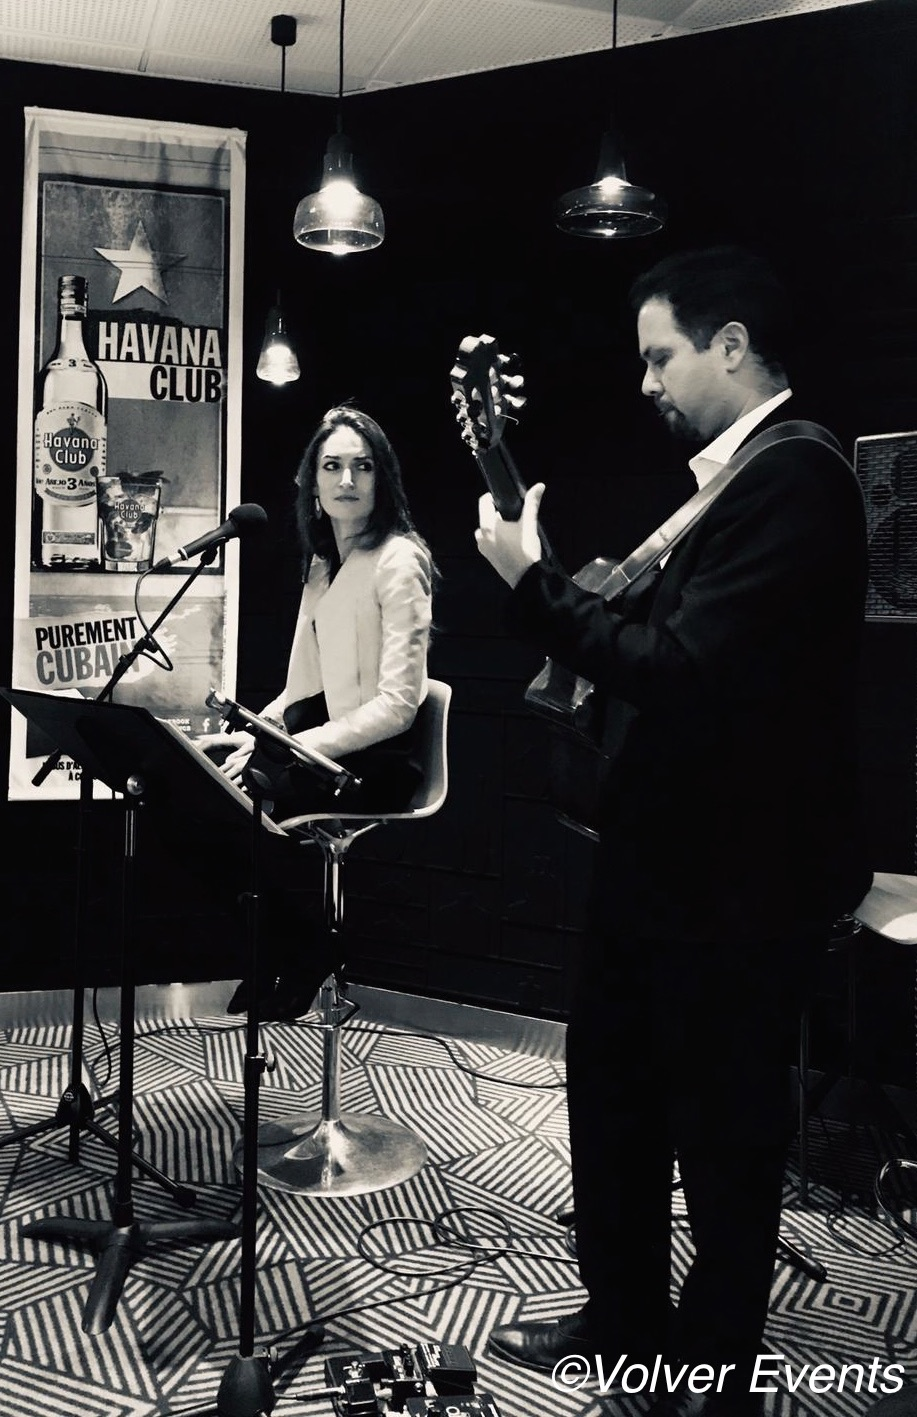 Yoan Fernandez & Lara Phanalasy - Afterwork Jazz & Bossa Nova